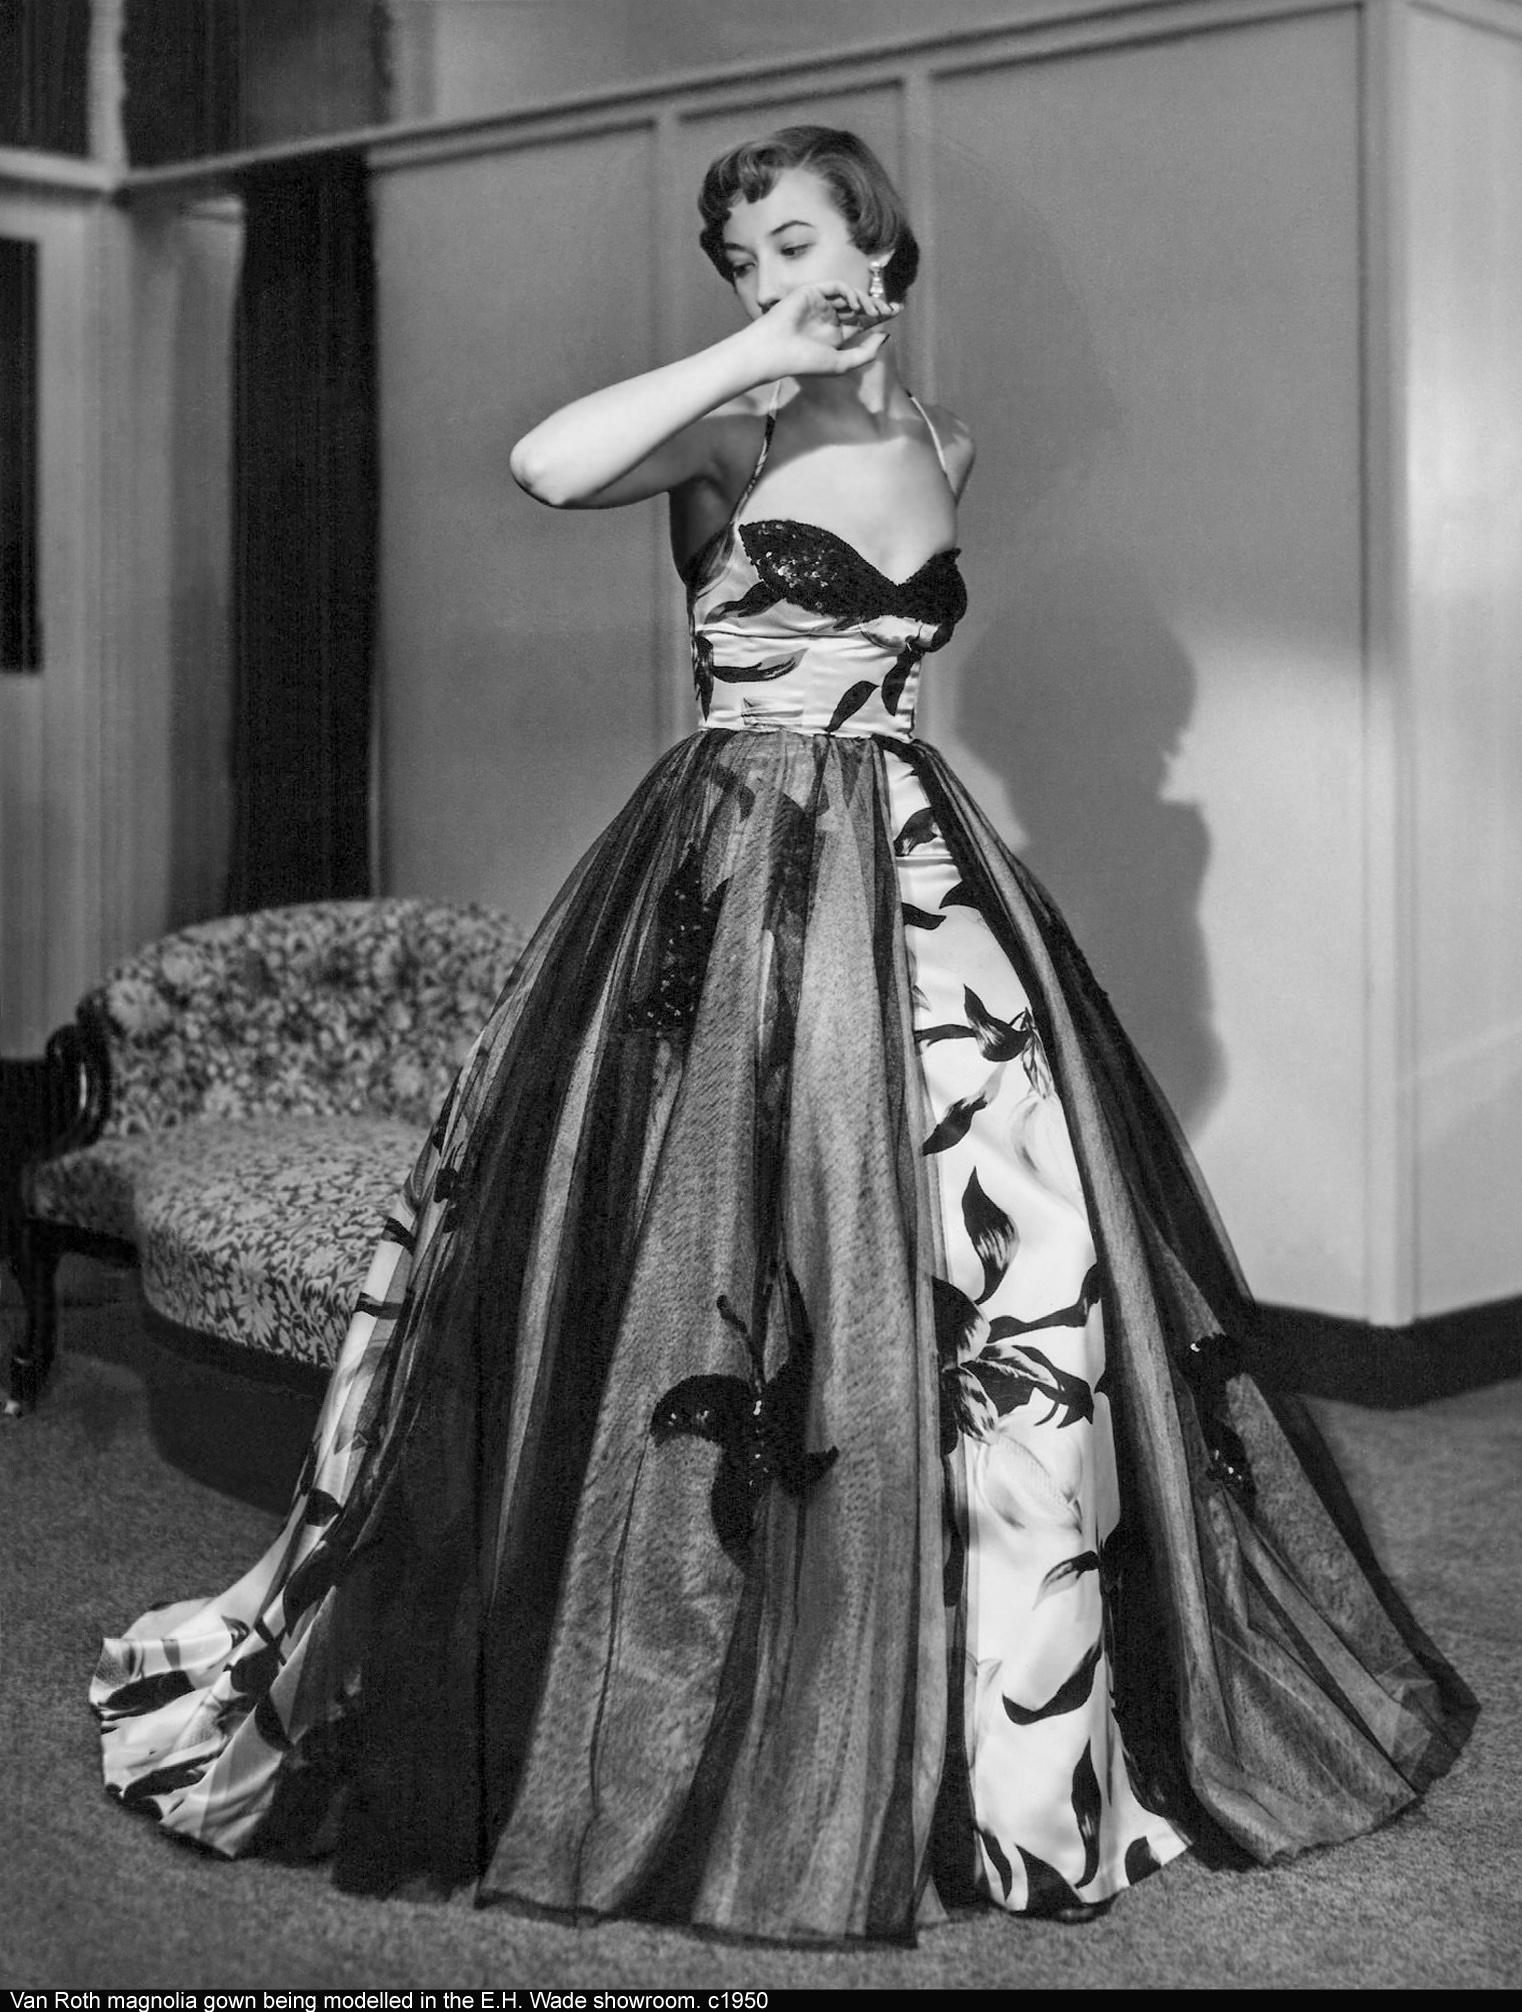 Van Roth Magnolia Gown c1950